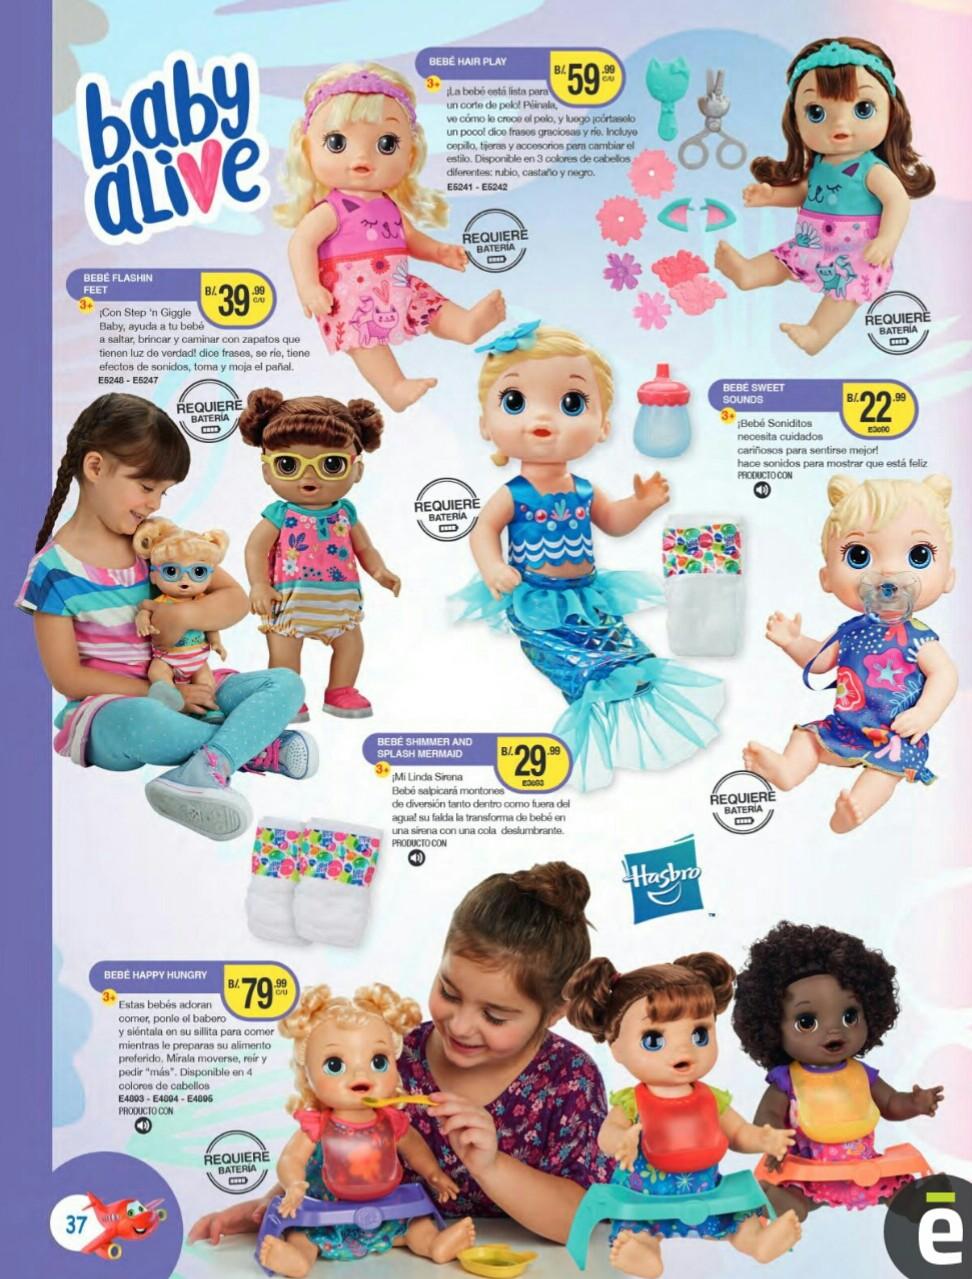 Catalogo juguetes Titan Toys 2019 p37